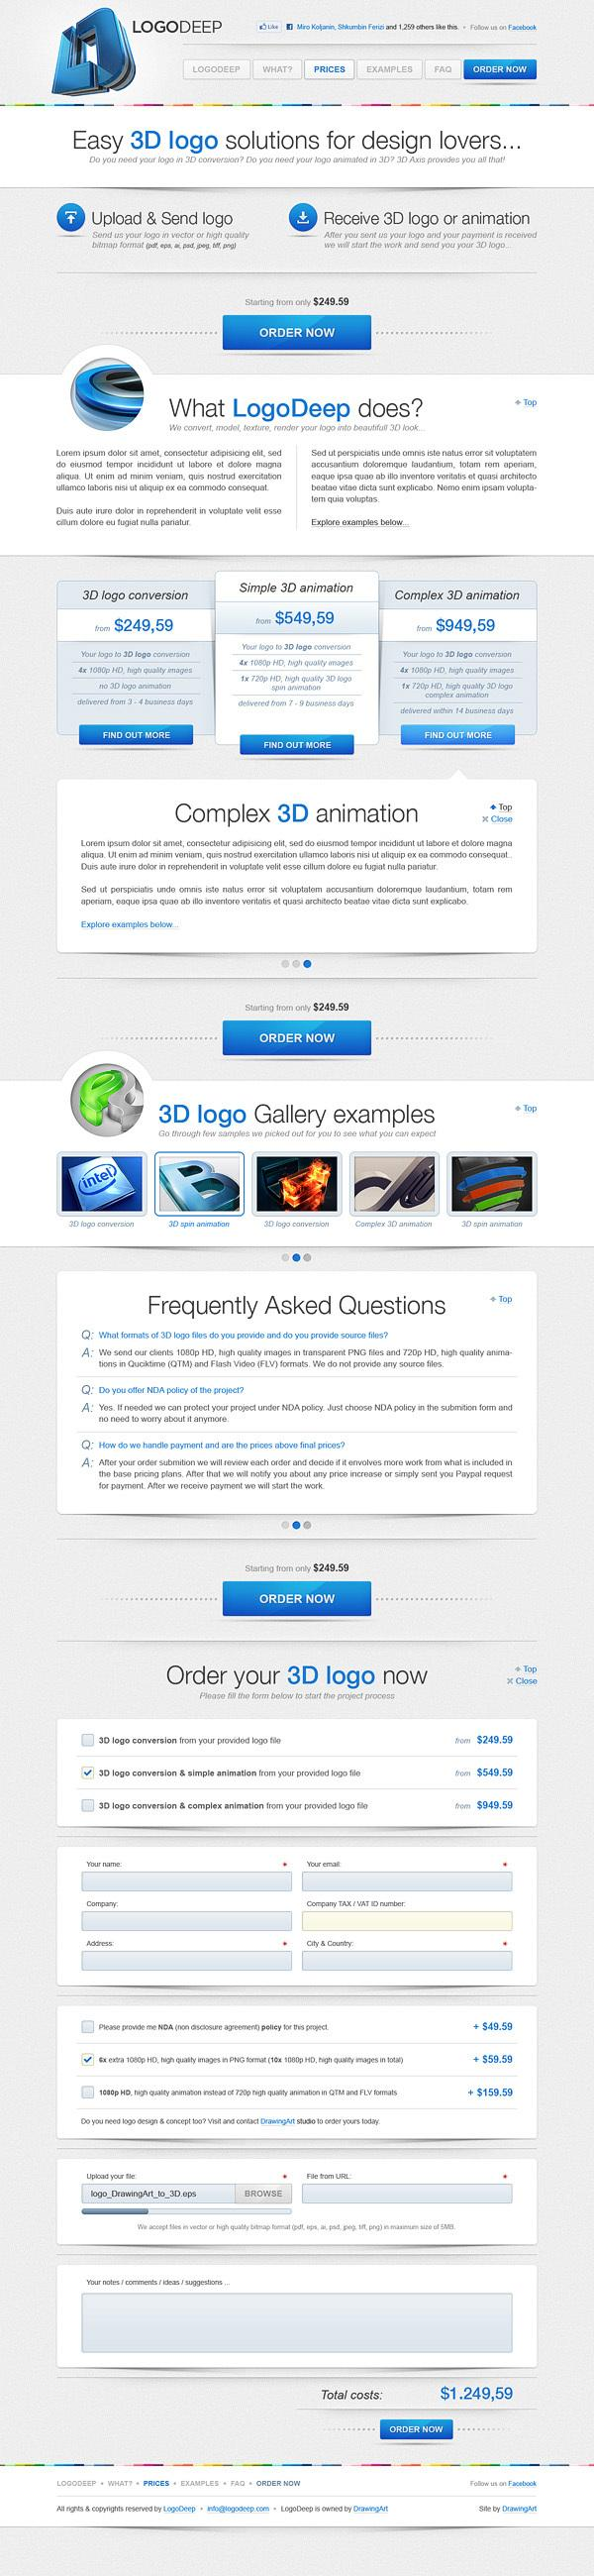 LogoDeep on Web Design Served